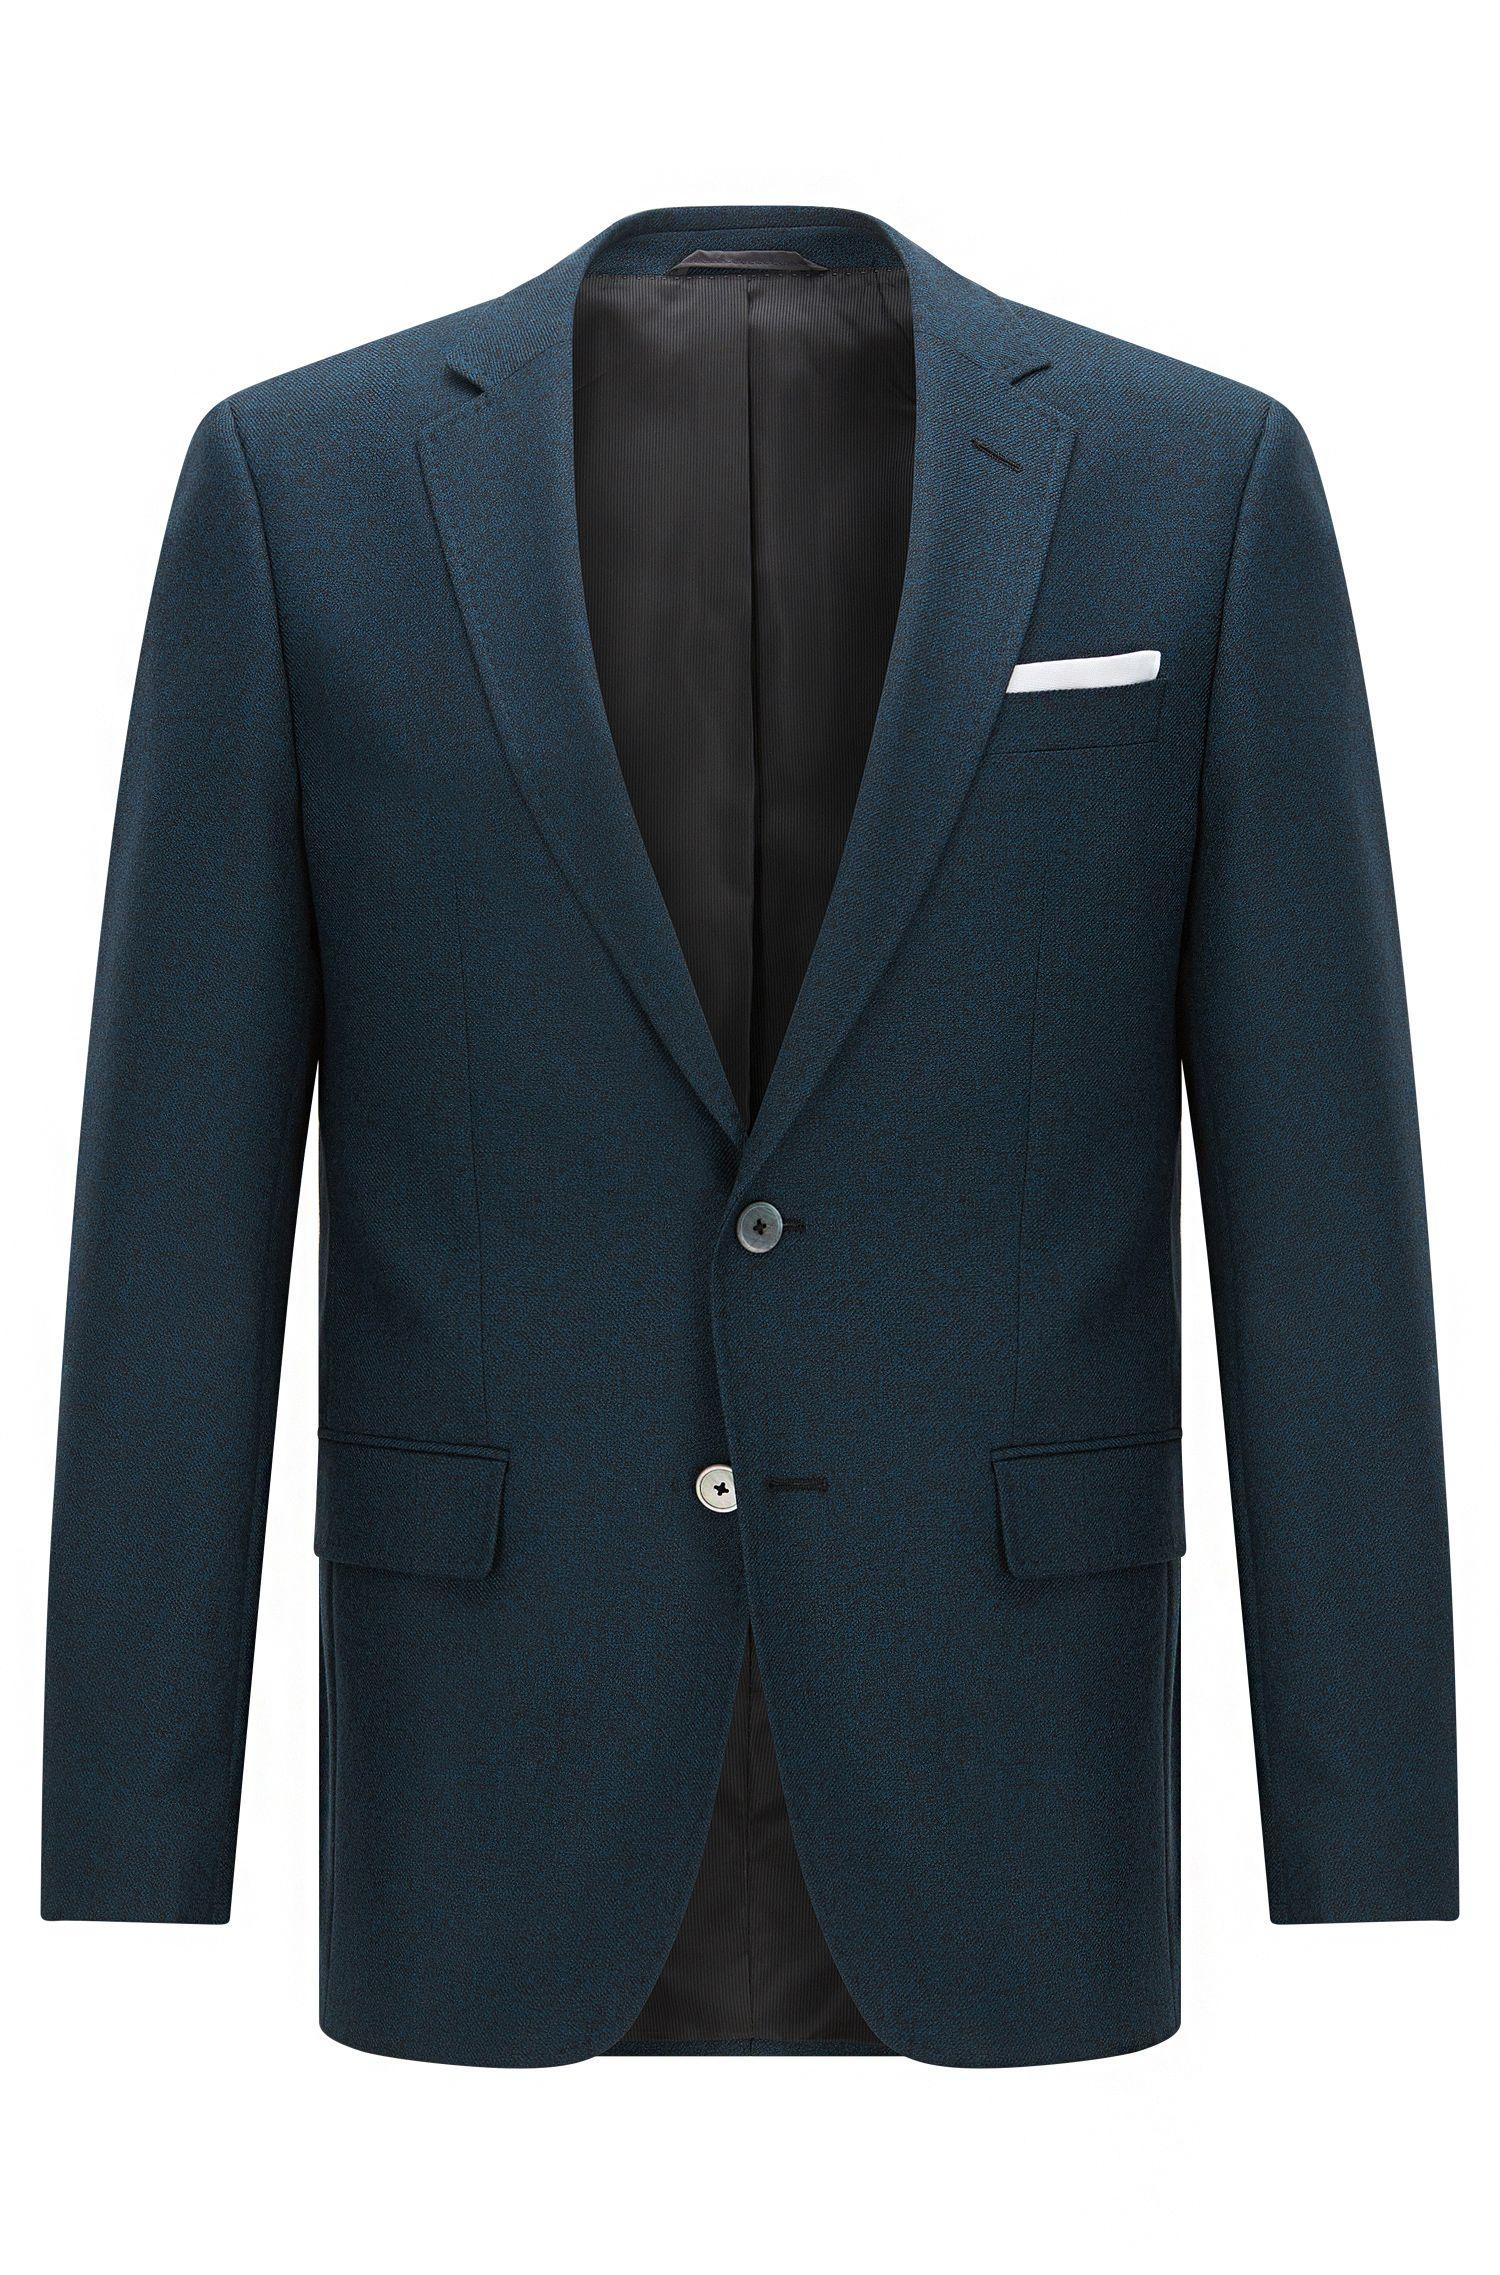 'Hutsons' | Slim Fit, Virgin Wool Sport Coat